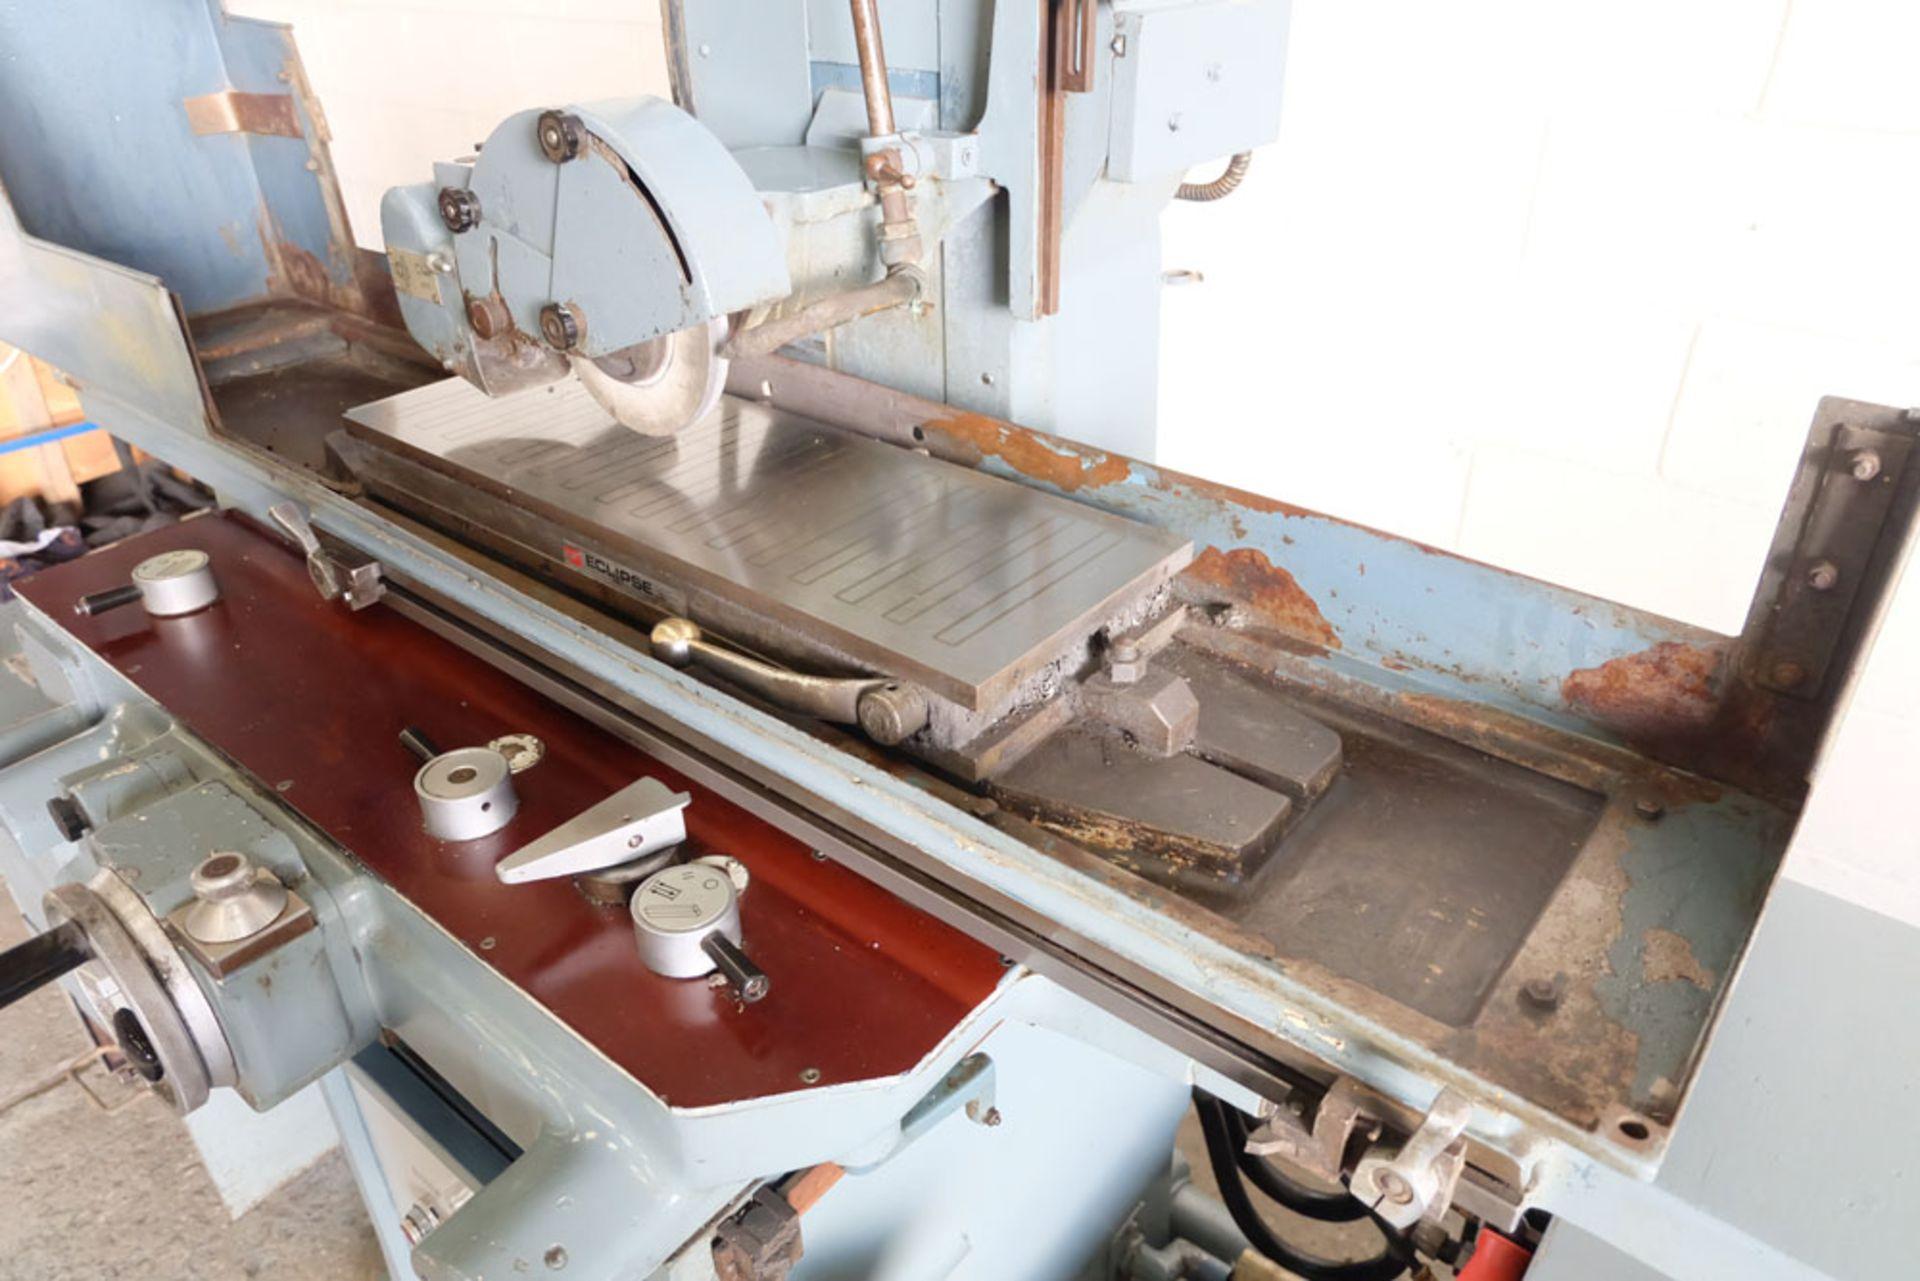 Jones & Shipman 1400P Toolroom Surface Grinder. - Image 3 of 13